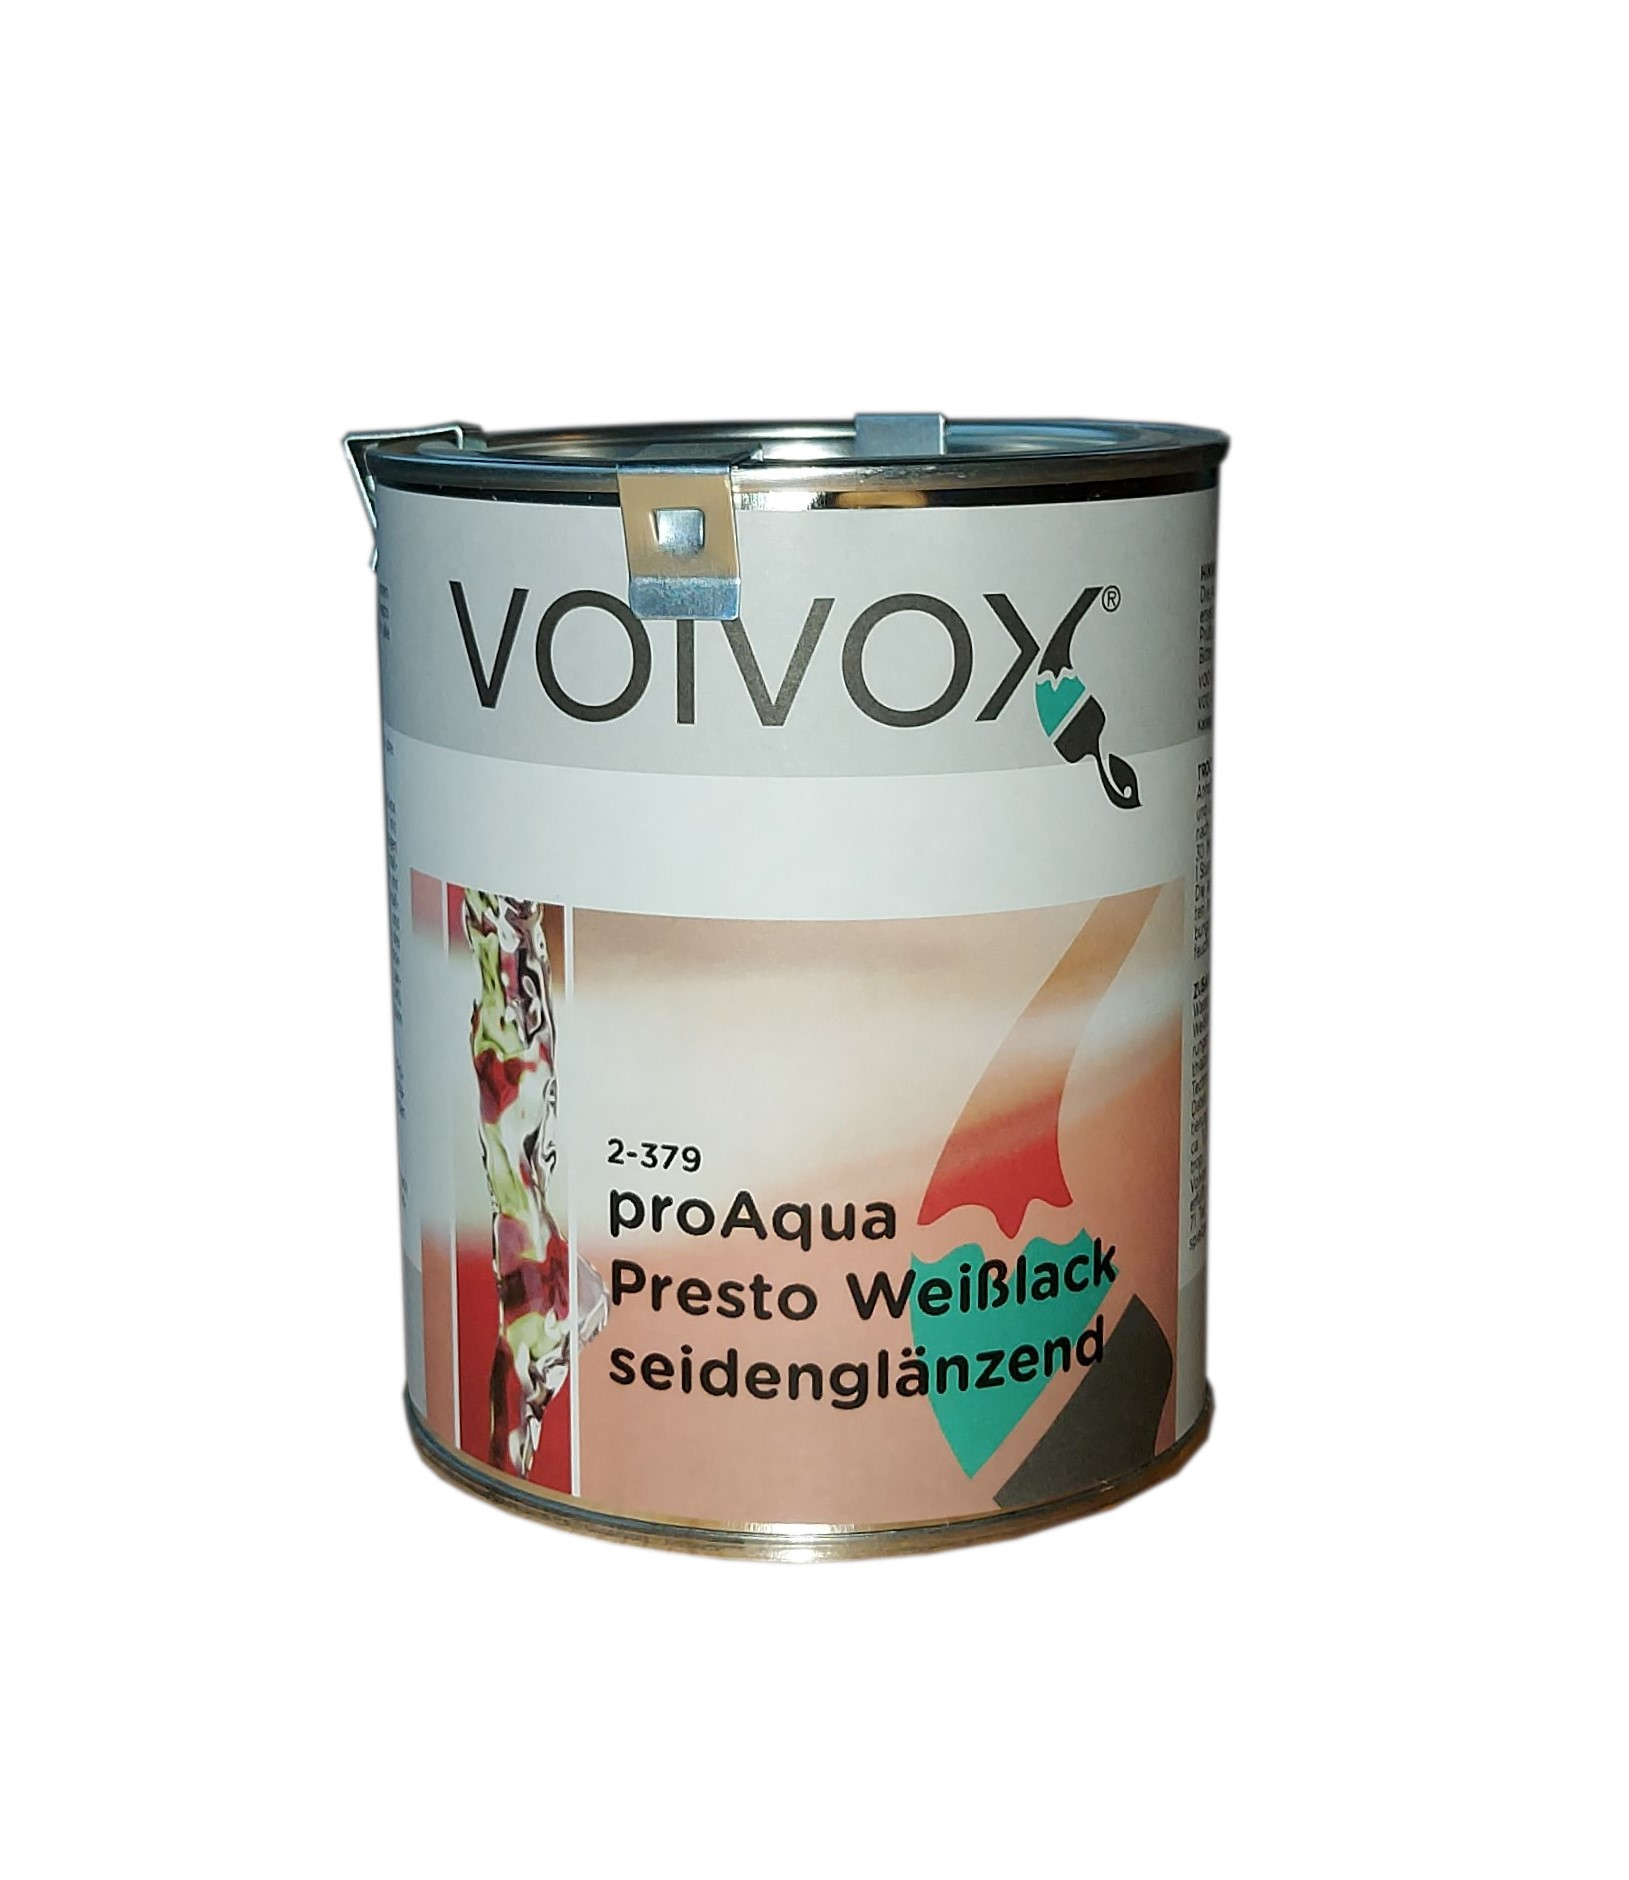 Volvox proAqua Presto Weißlack